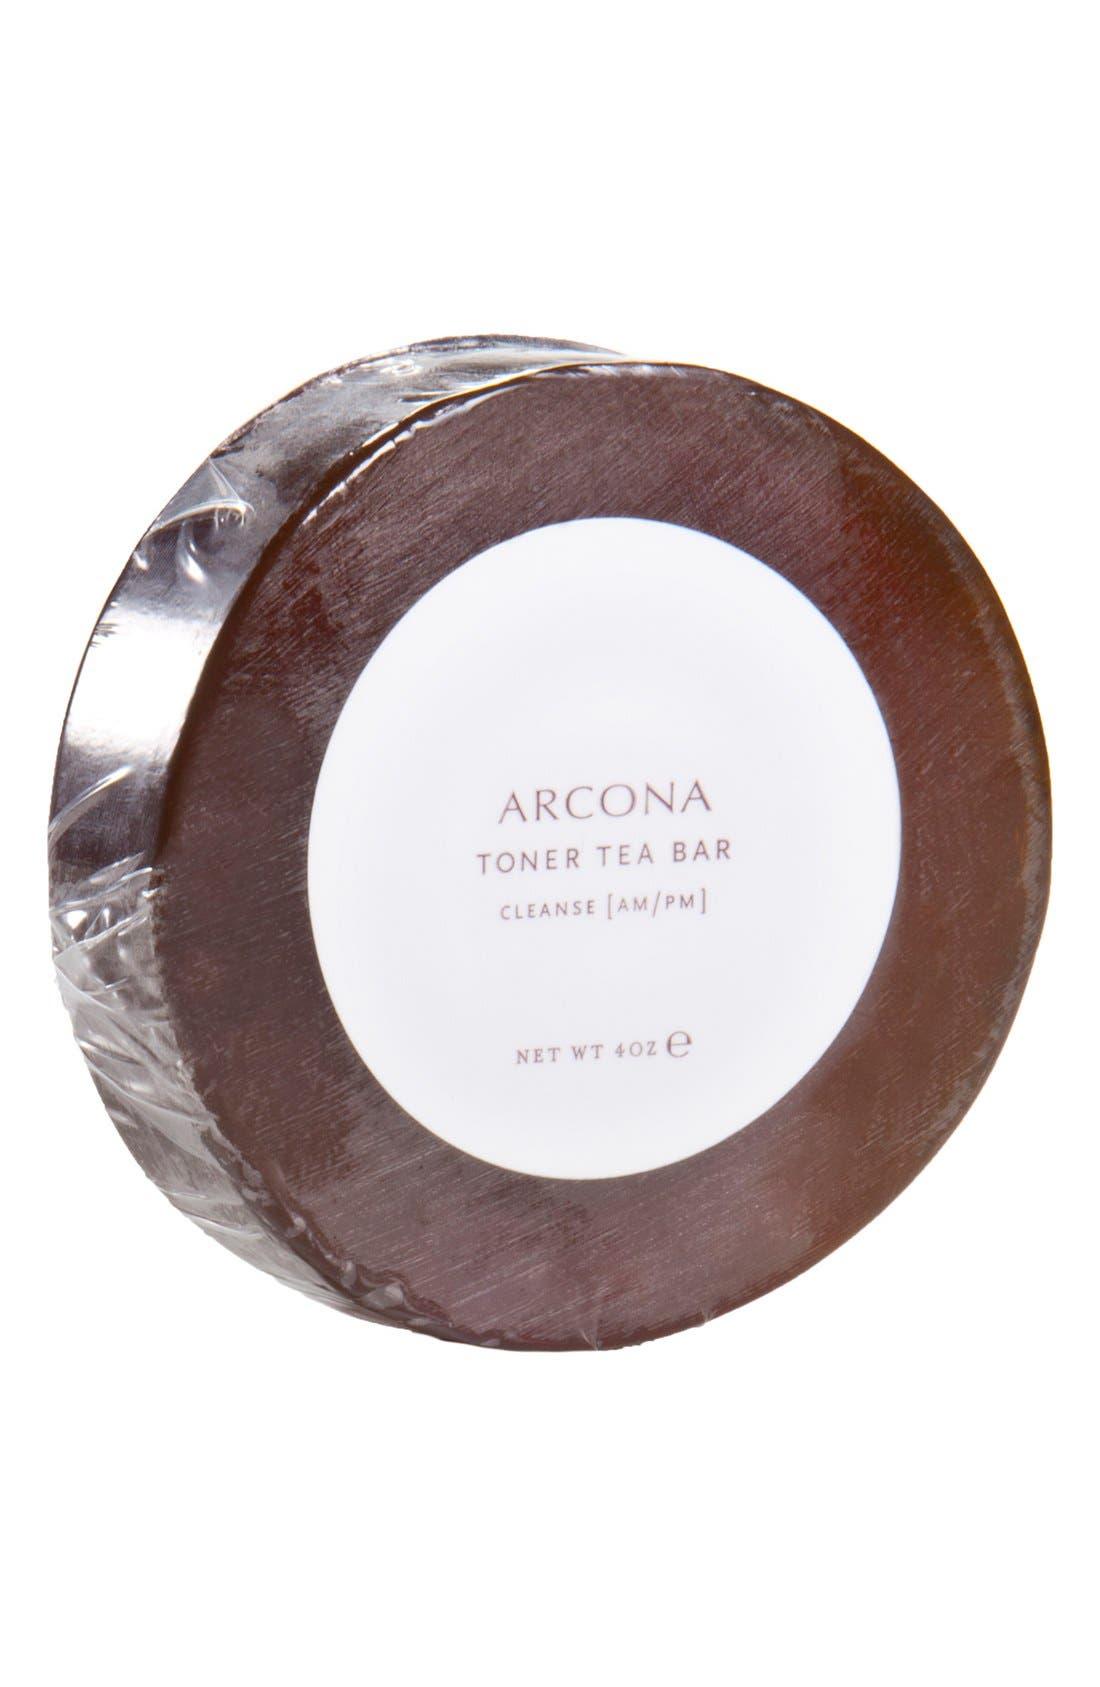 ARCONA Toner Tea Cleansing Bar Refill, Main, color, NO COLOR